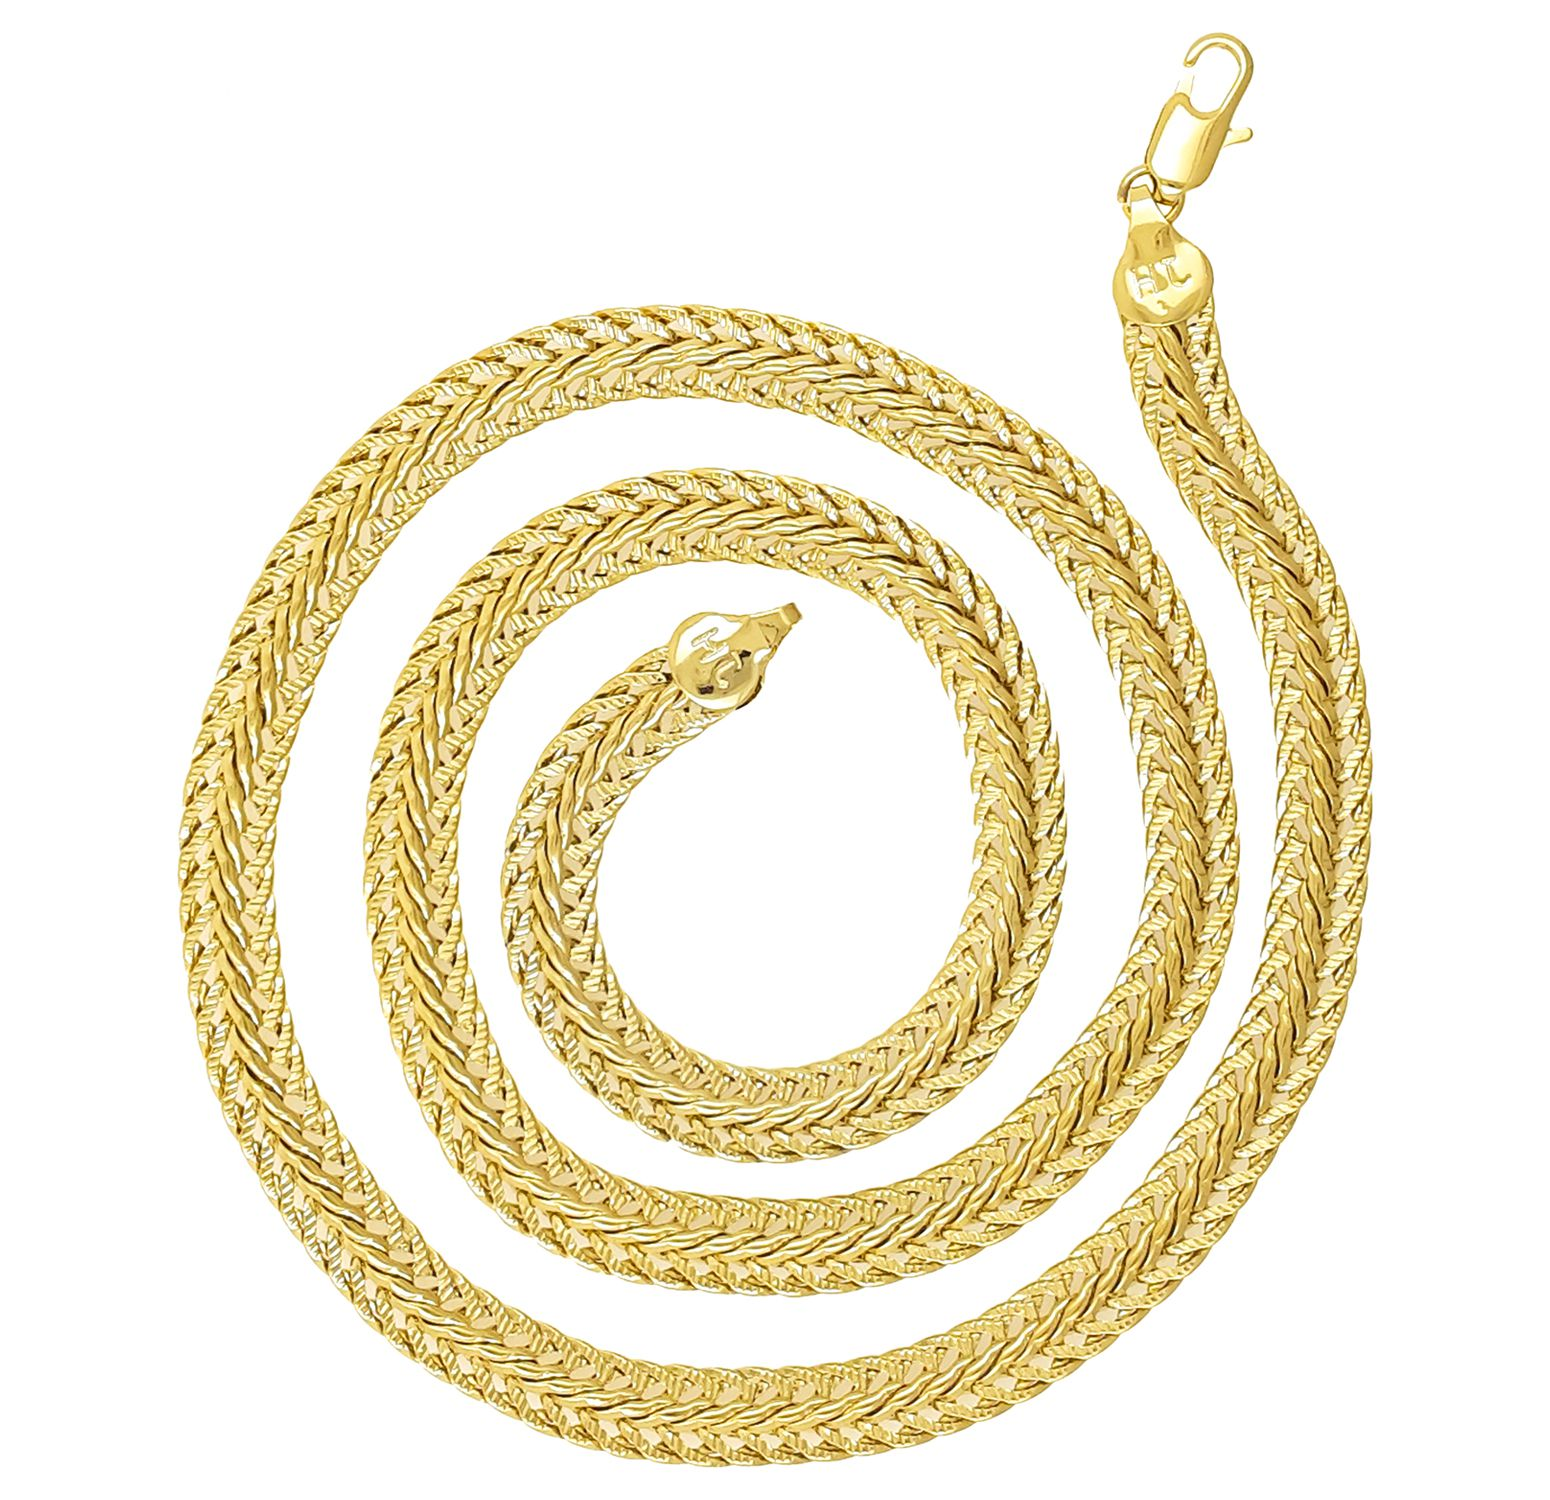 Saizen CH213 Smooth Gold Tone Chain For Men, Boyfriend & Husband